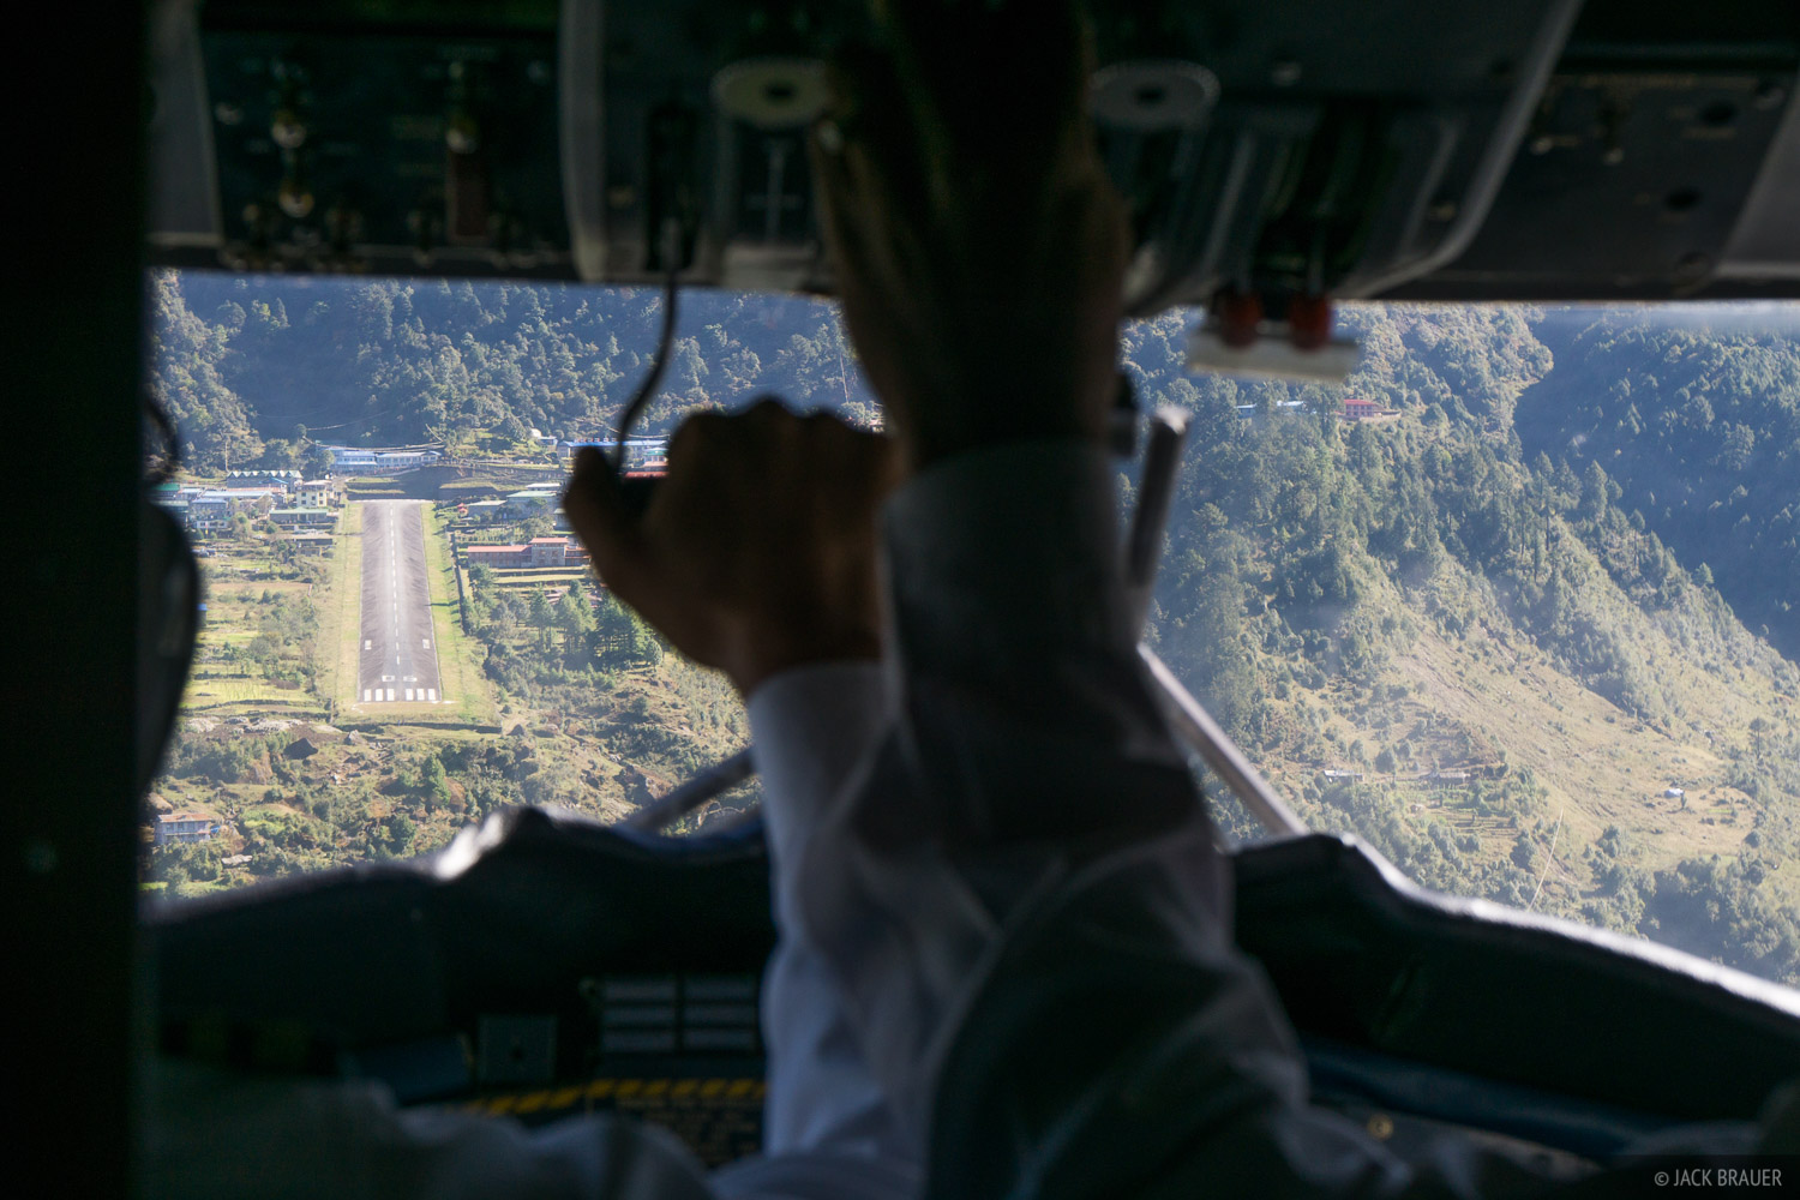 Himalaya,Khumbu,Lukla,Nepal,aerial, photo